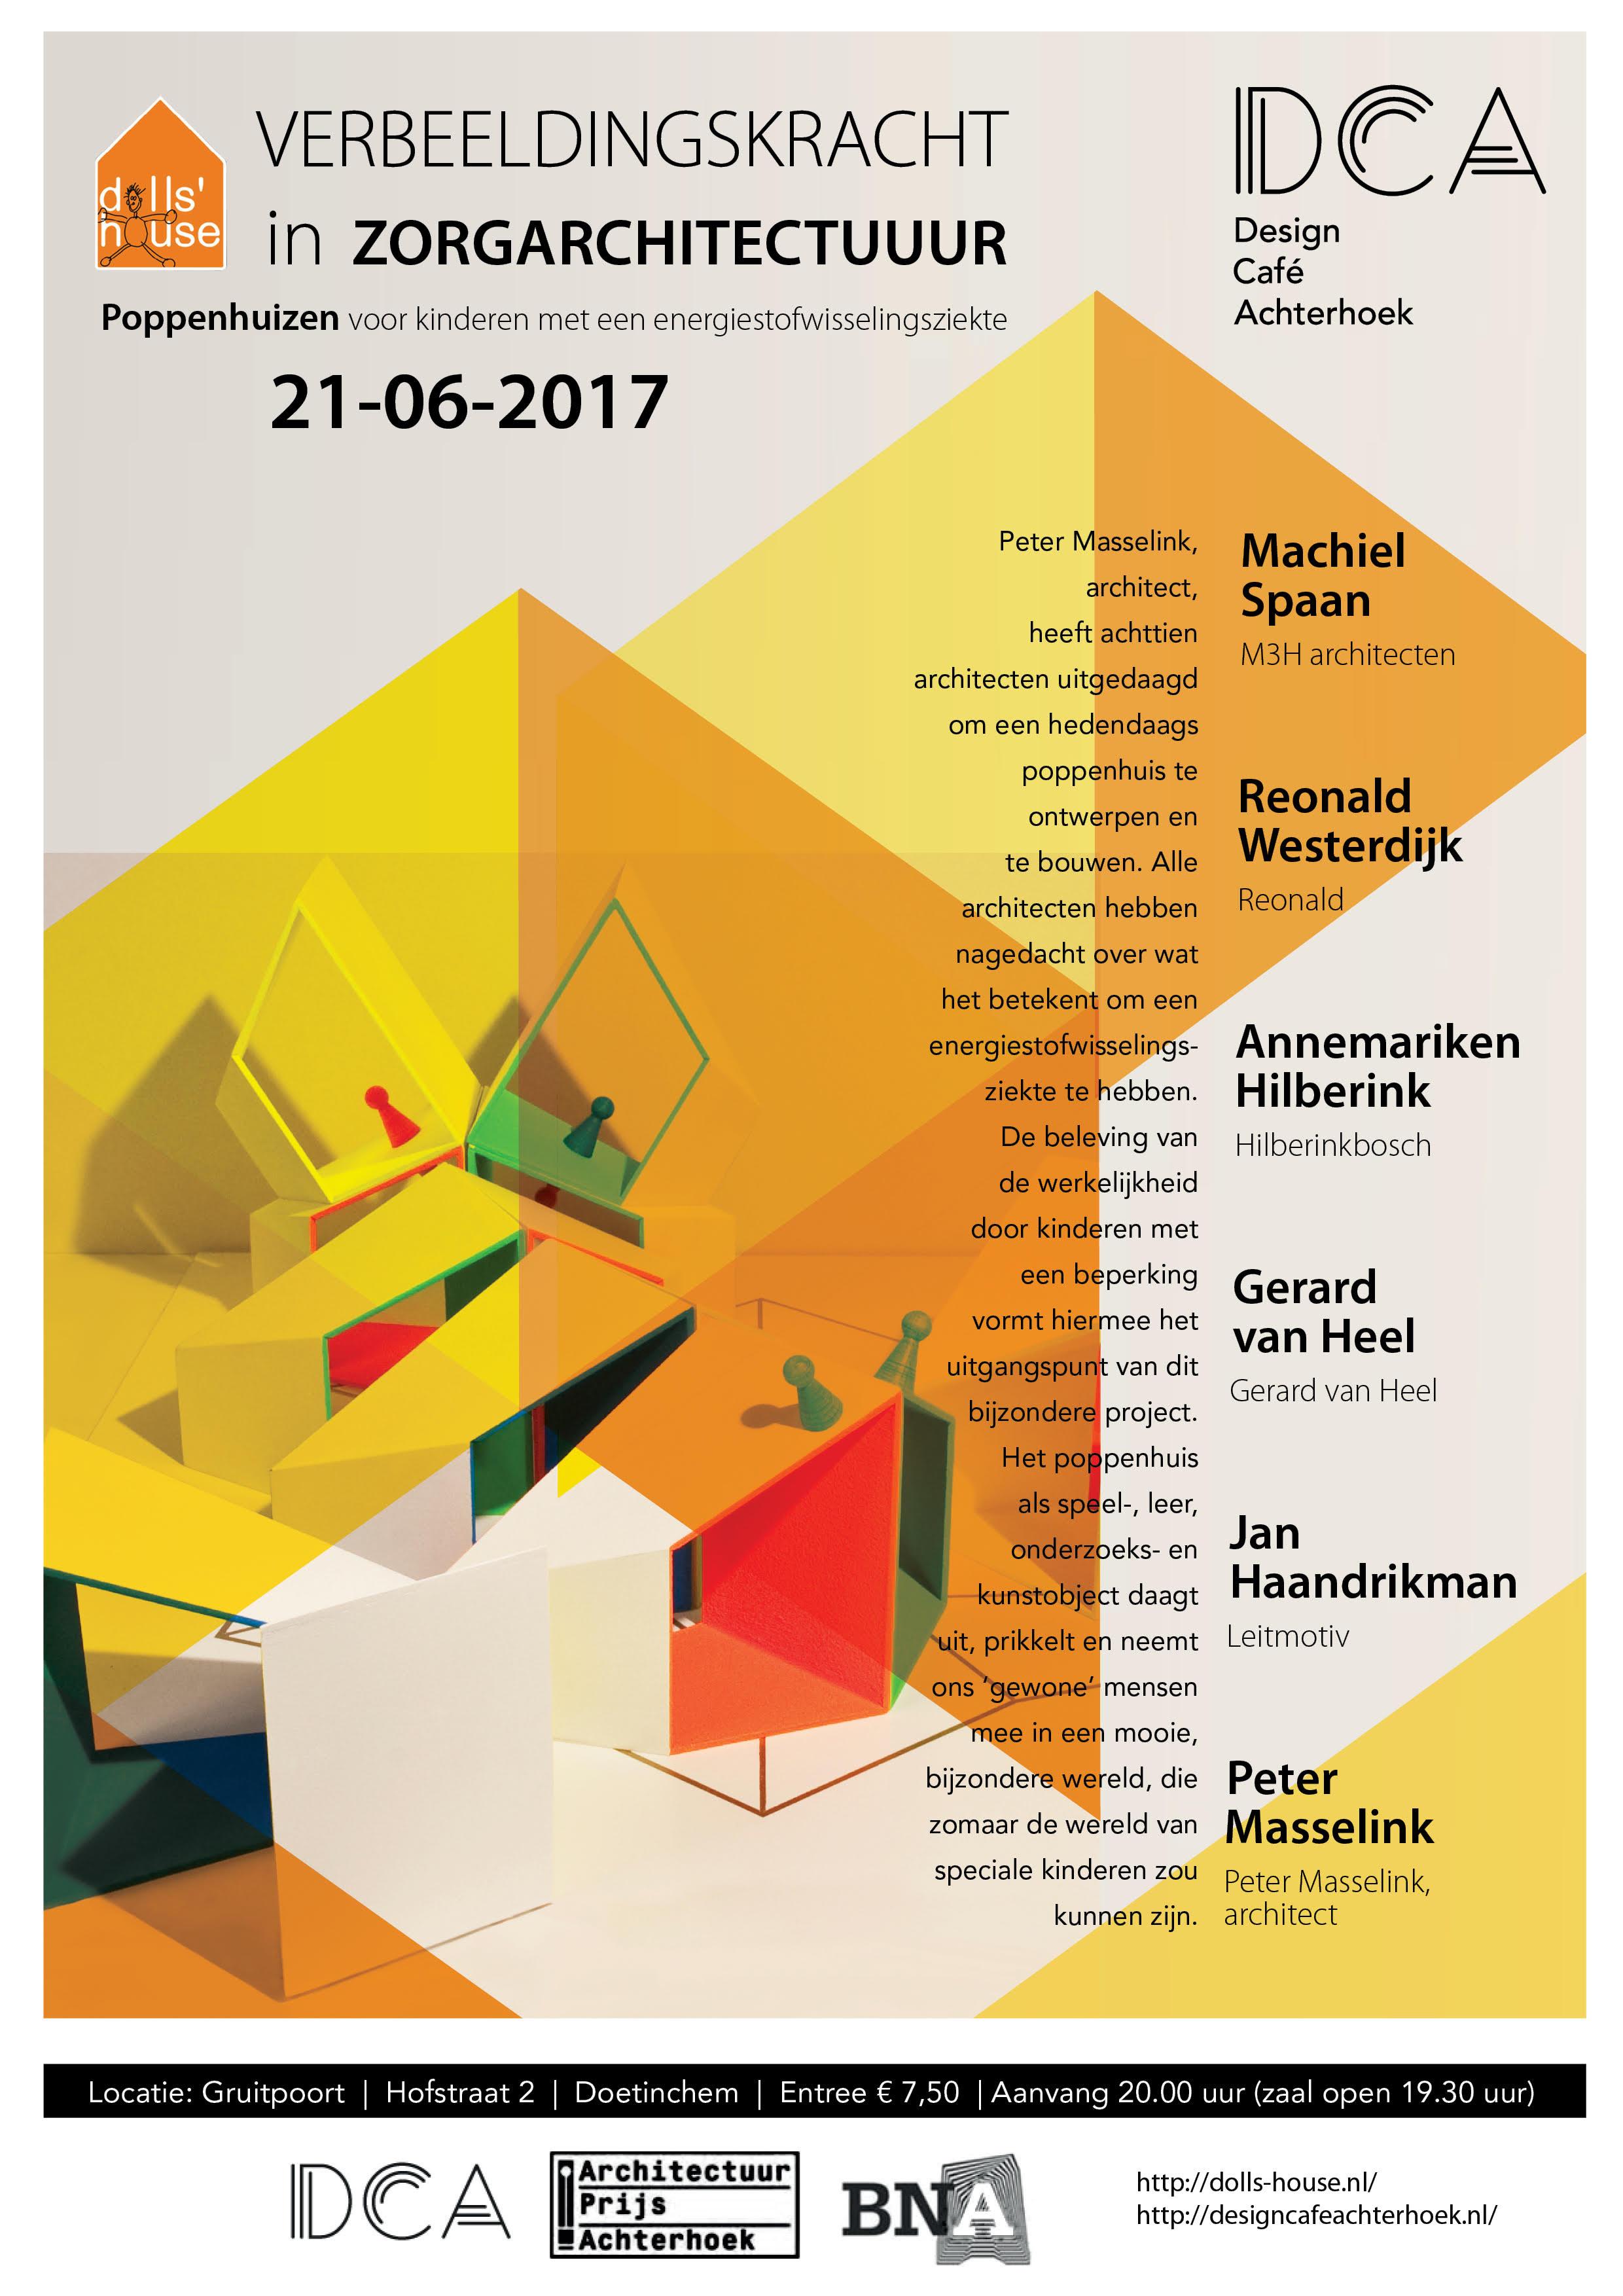 luisterhuis (2017) – opening